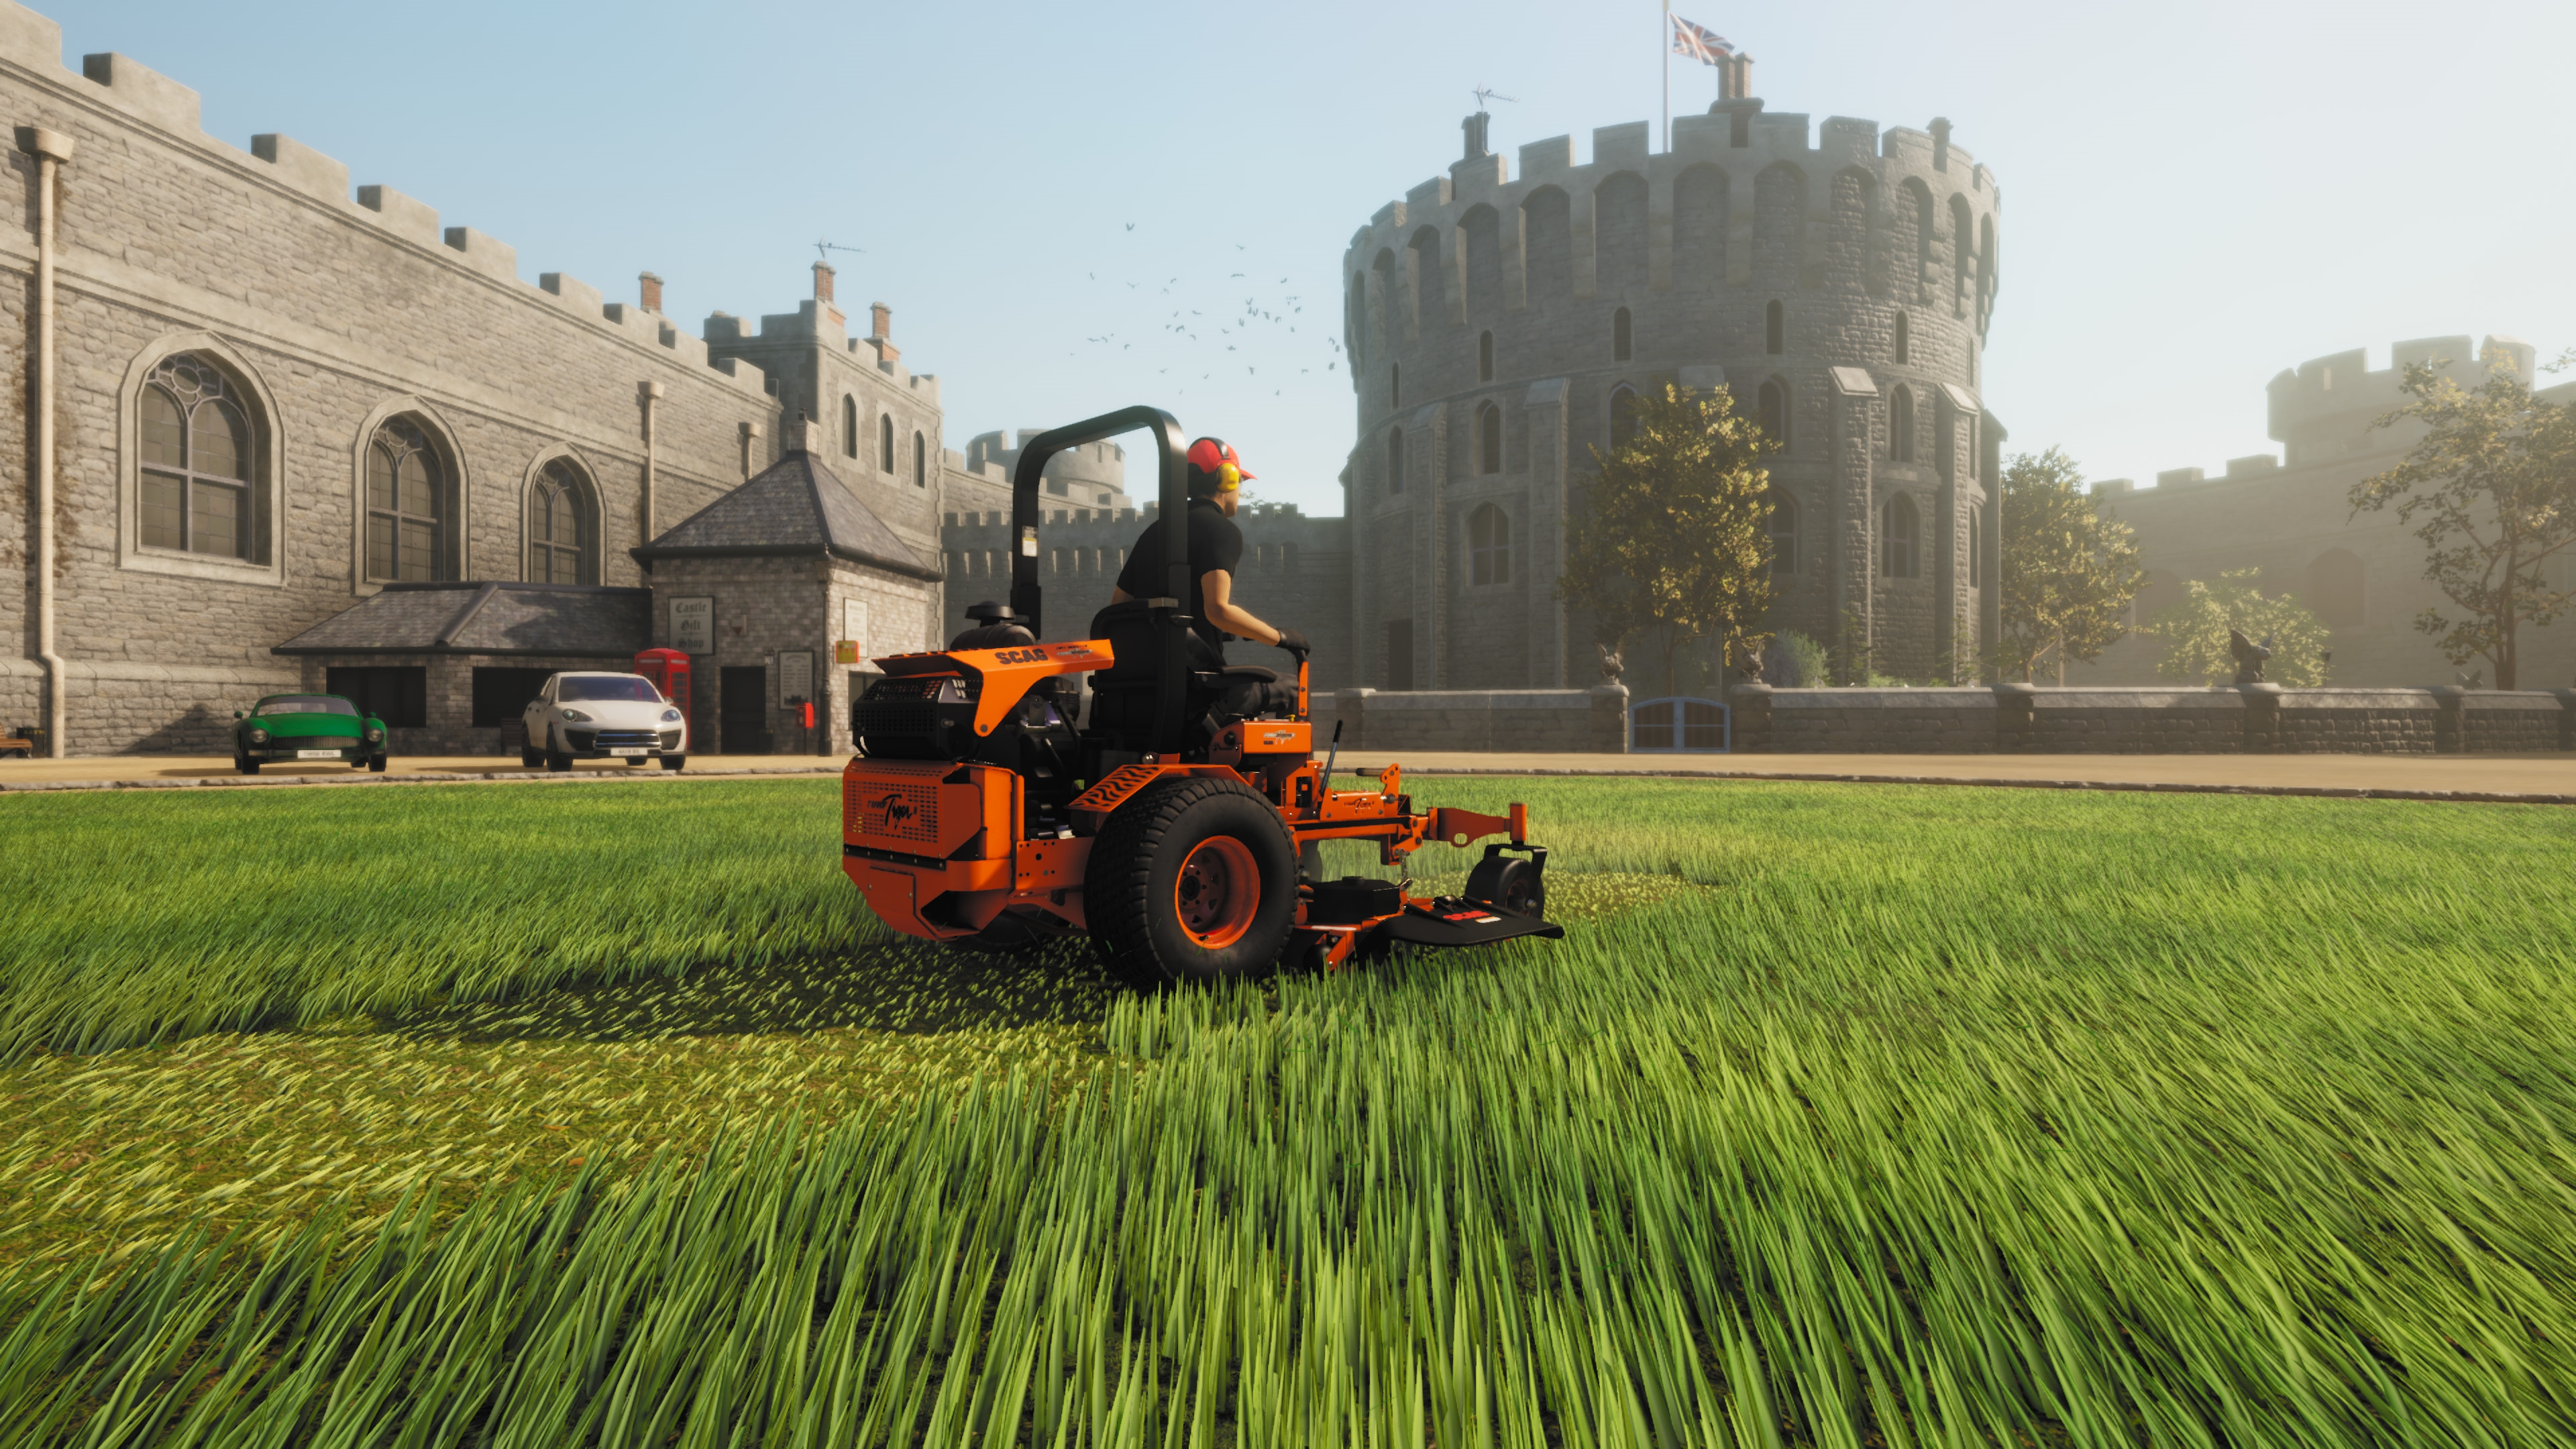 Lawn Mowing Simulator | ROW (24680ecd-5b66-4148-866c-f3a464e5d5db)